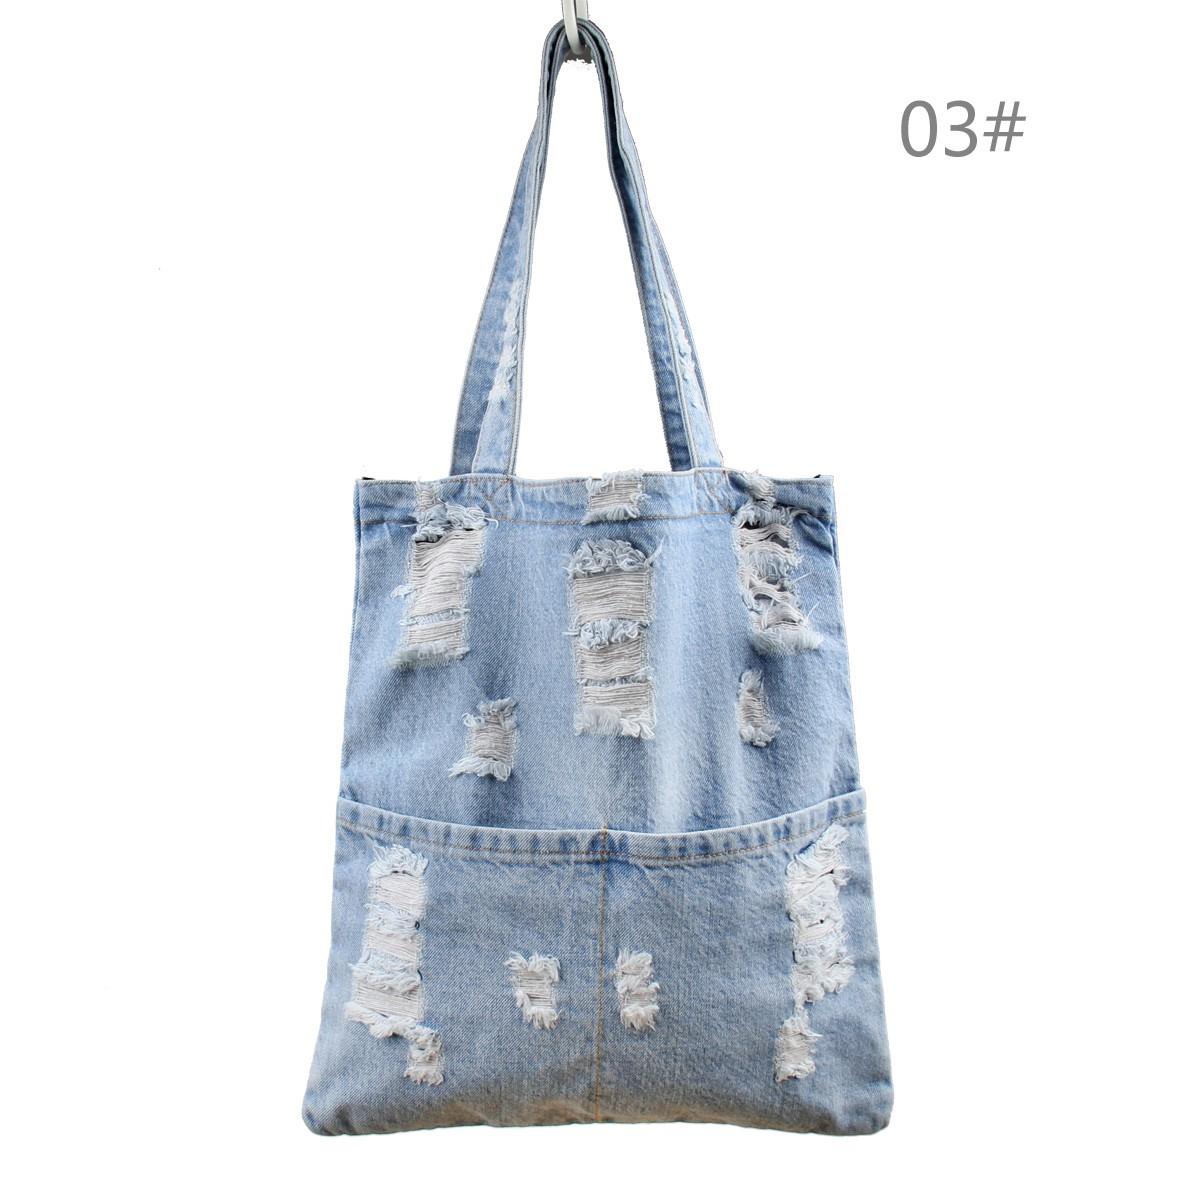 Fashion Women Girl Large Denim Jean Handbag Tote Messenger Hobo Shoulder Bags | eBay